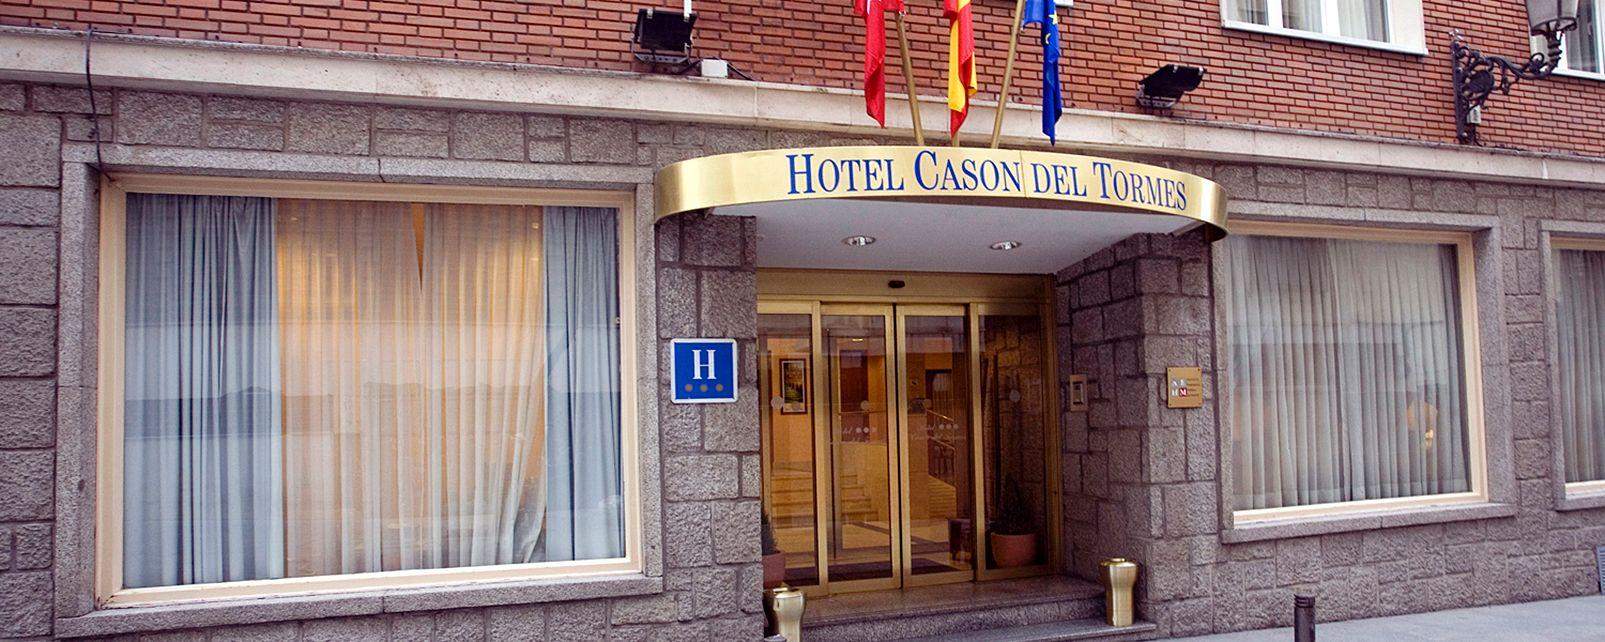 Hotel Casón del Tomes